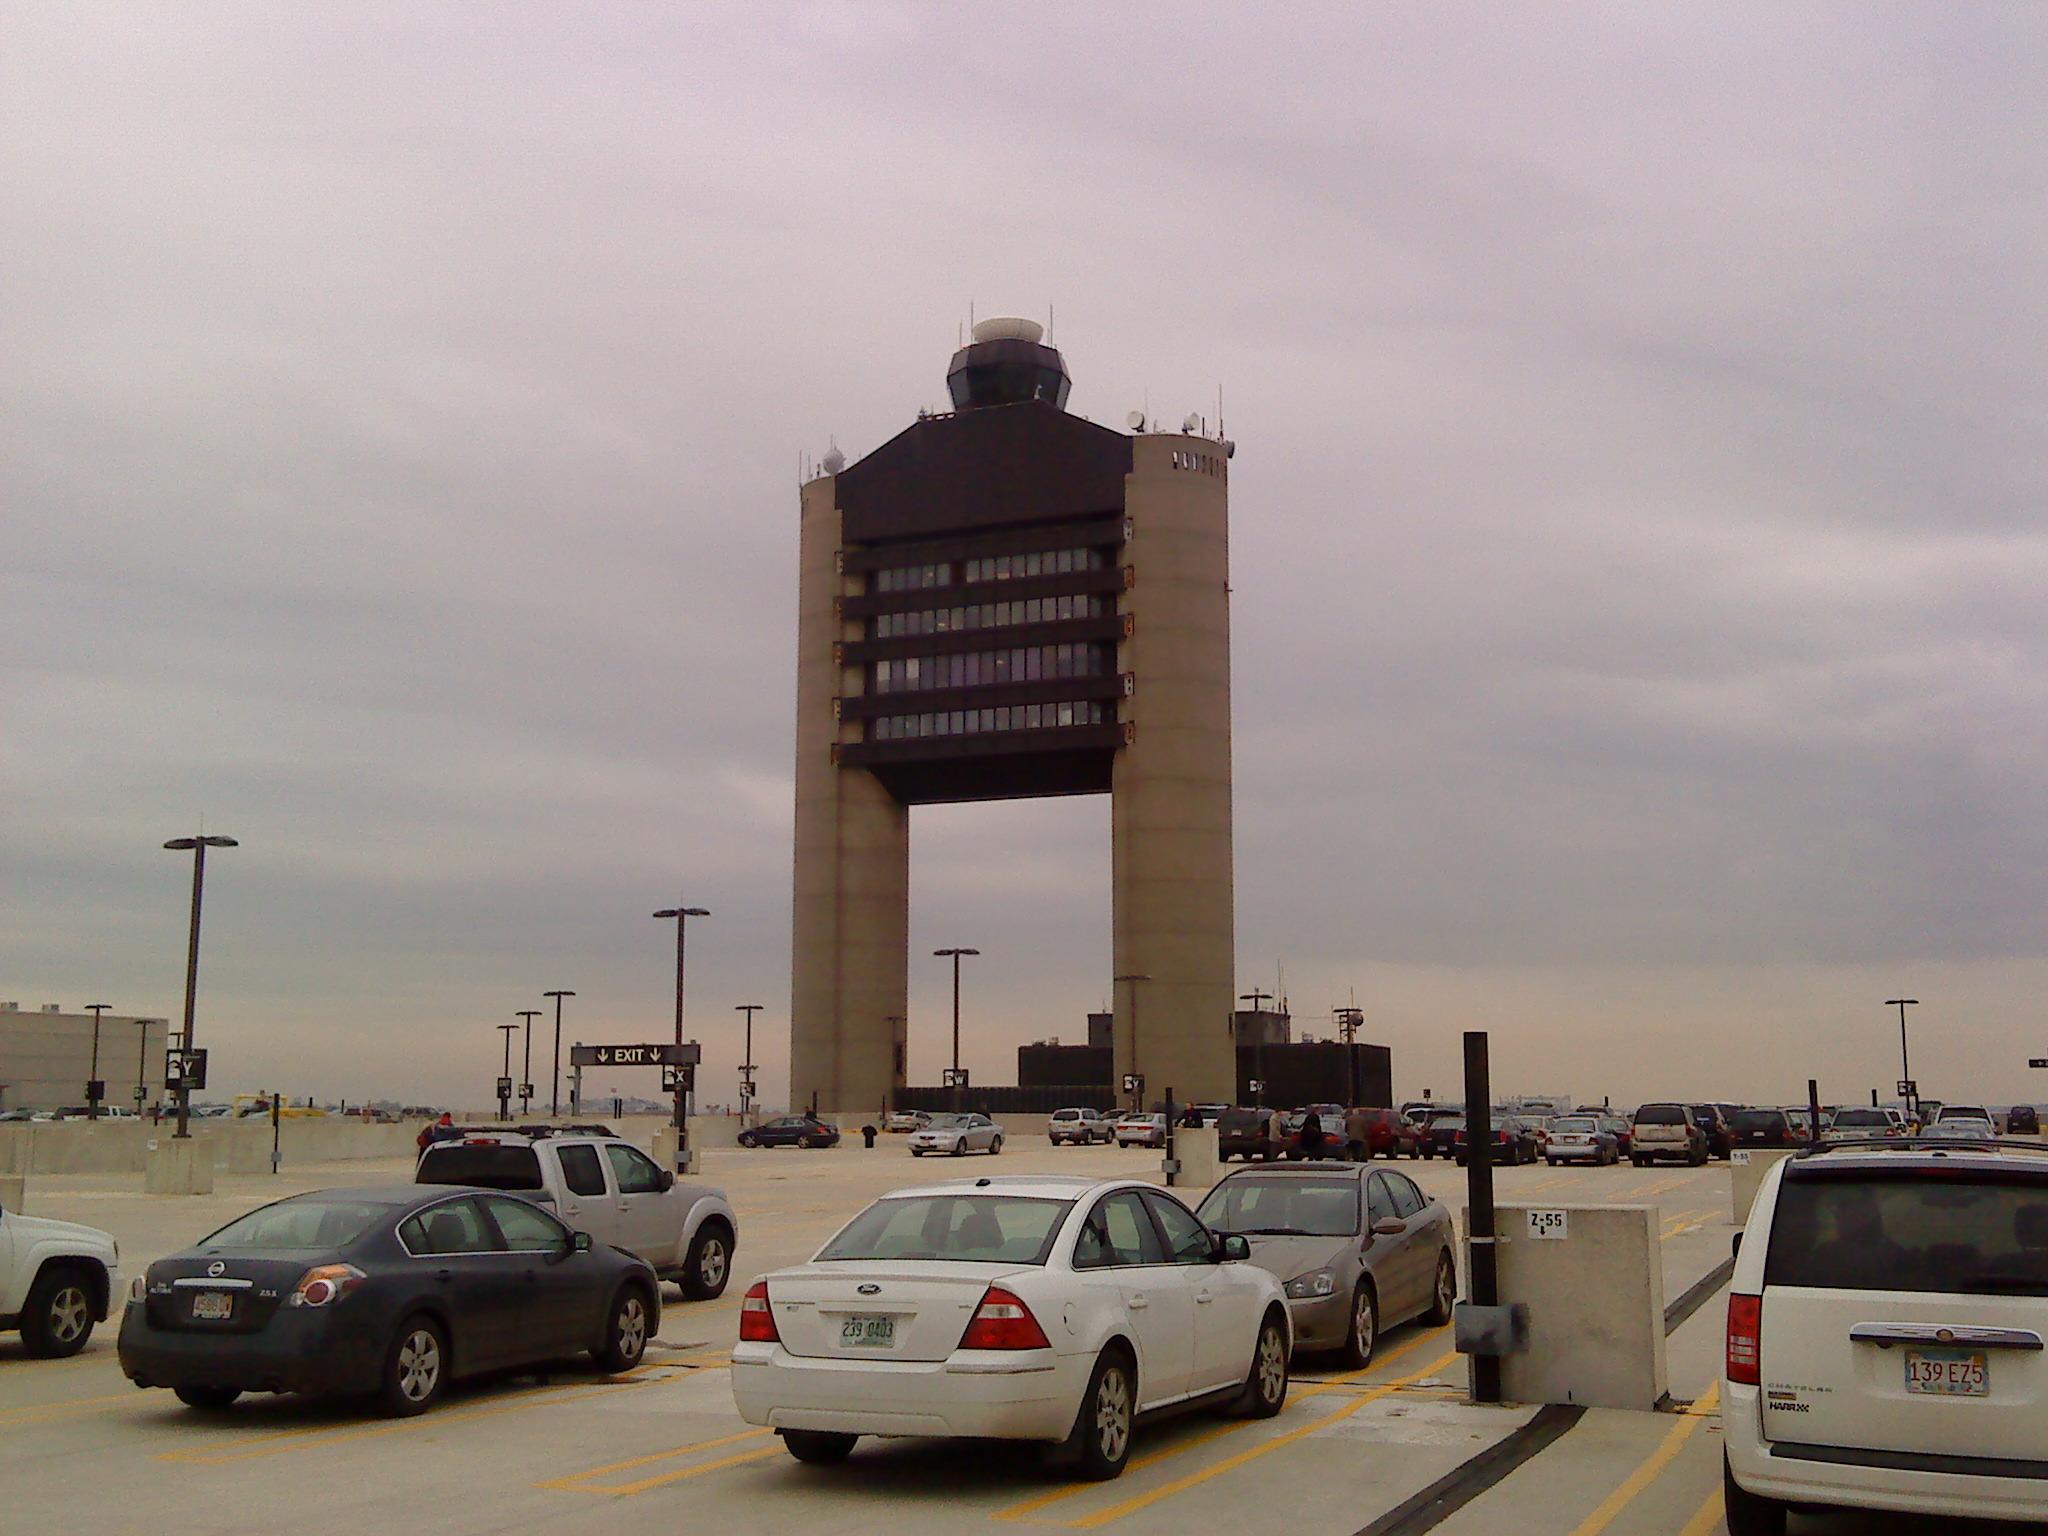 Markanter Tower des Flughafens